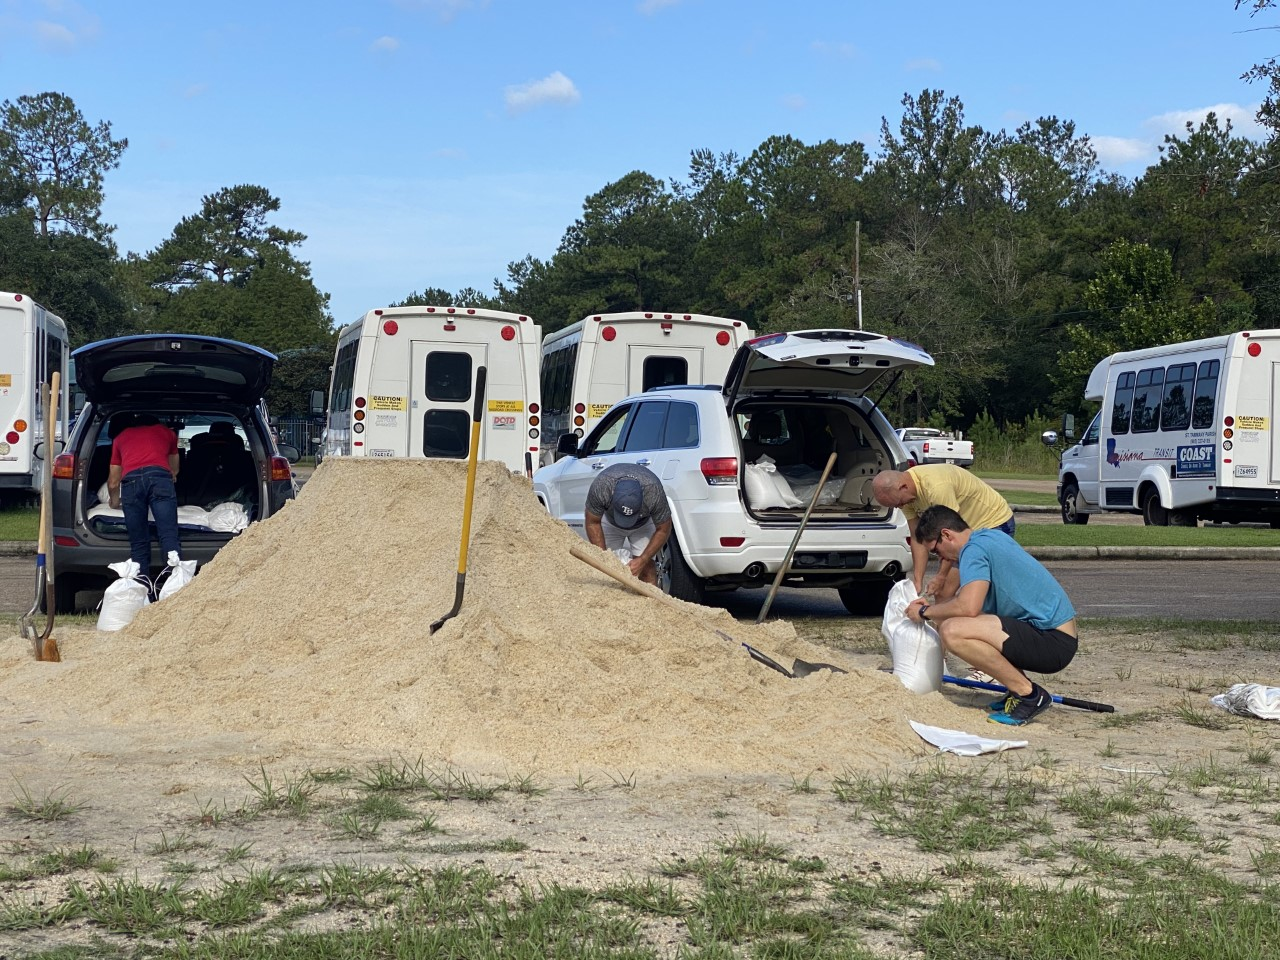 St. Tammany sandbag filling locations for Tropical Storm Ida